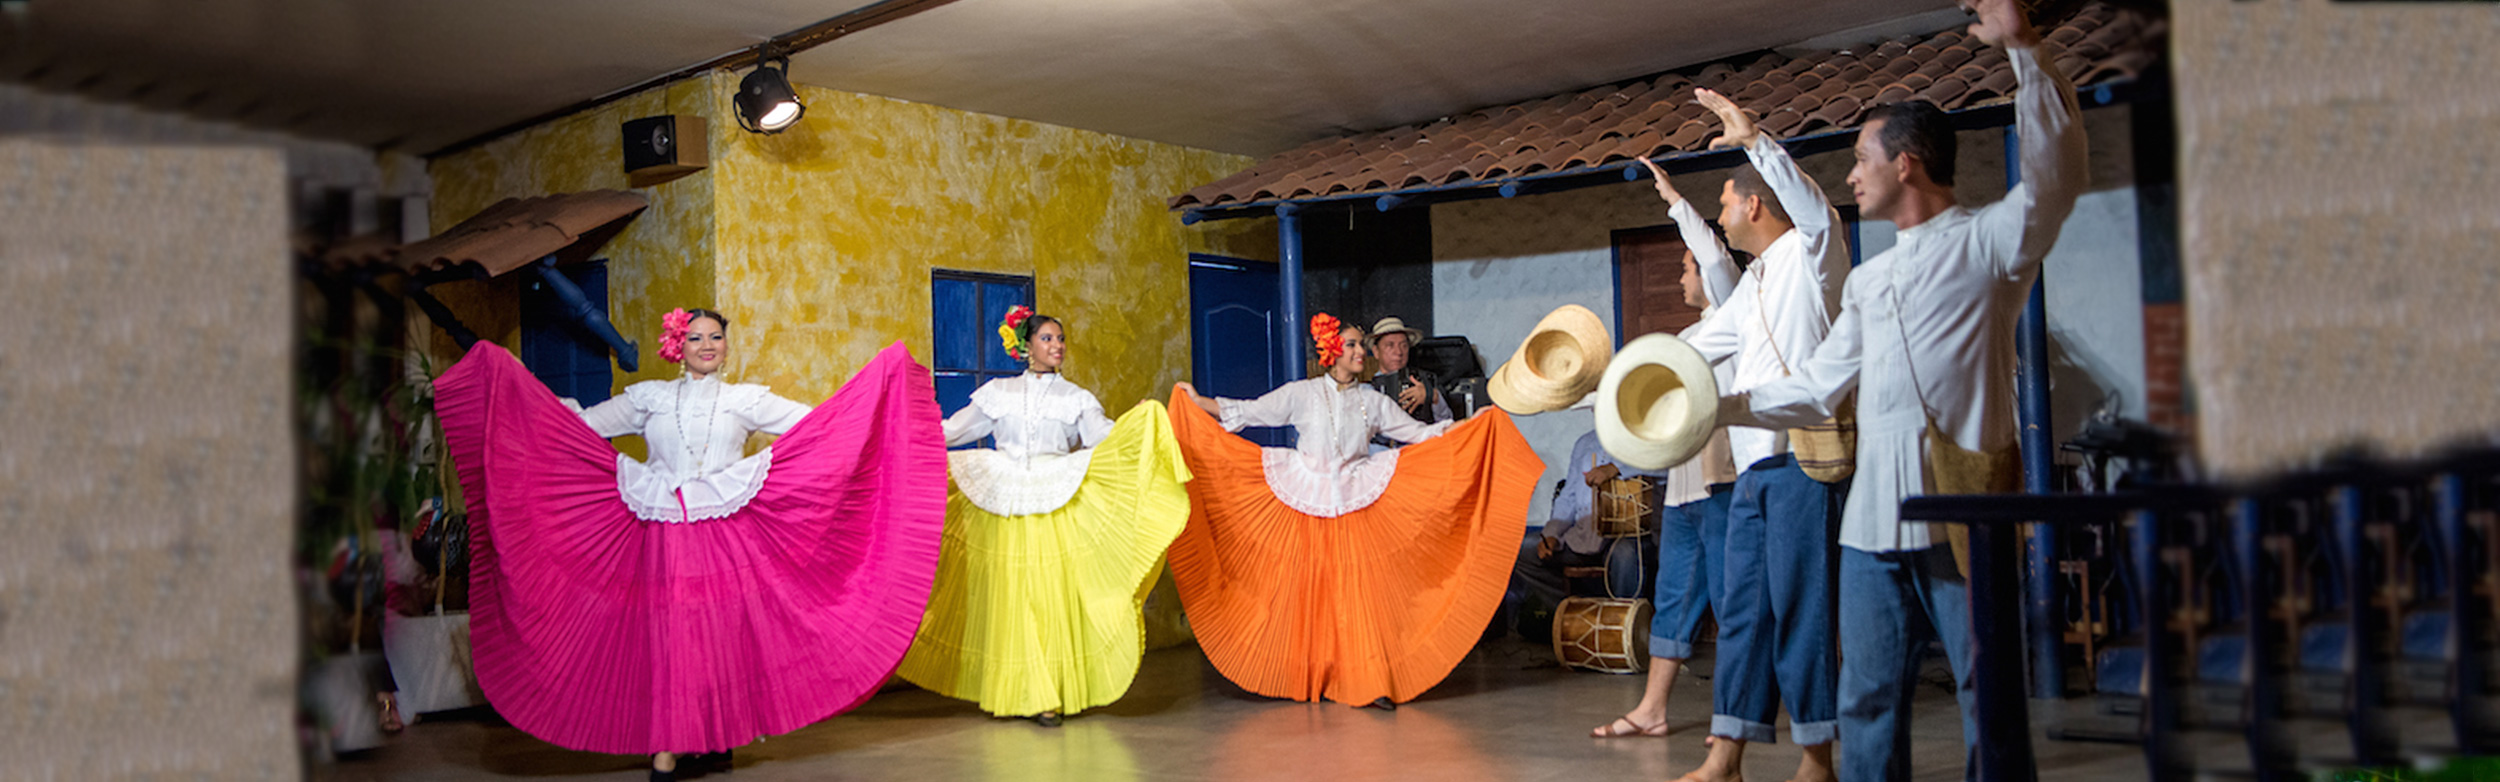 Panama Folkloric Dinner & Show